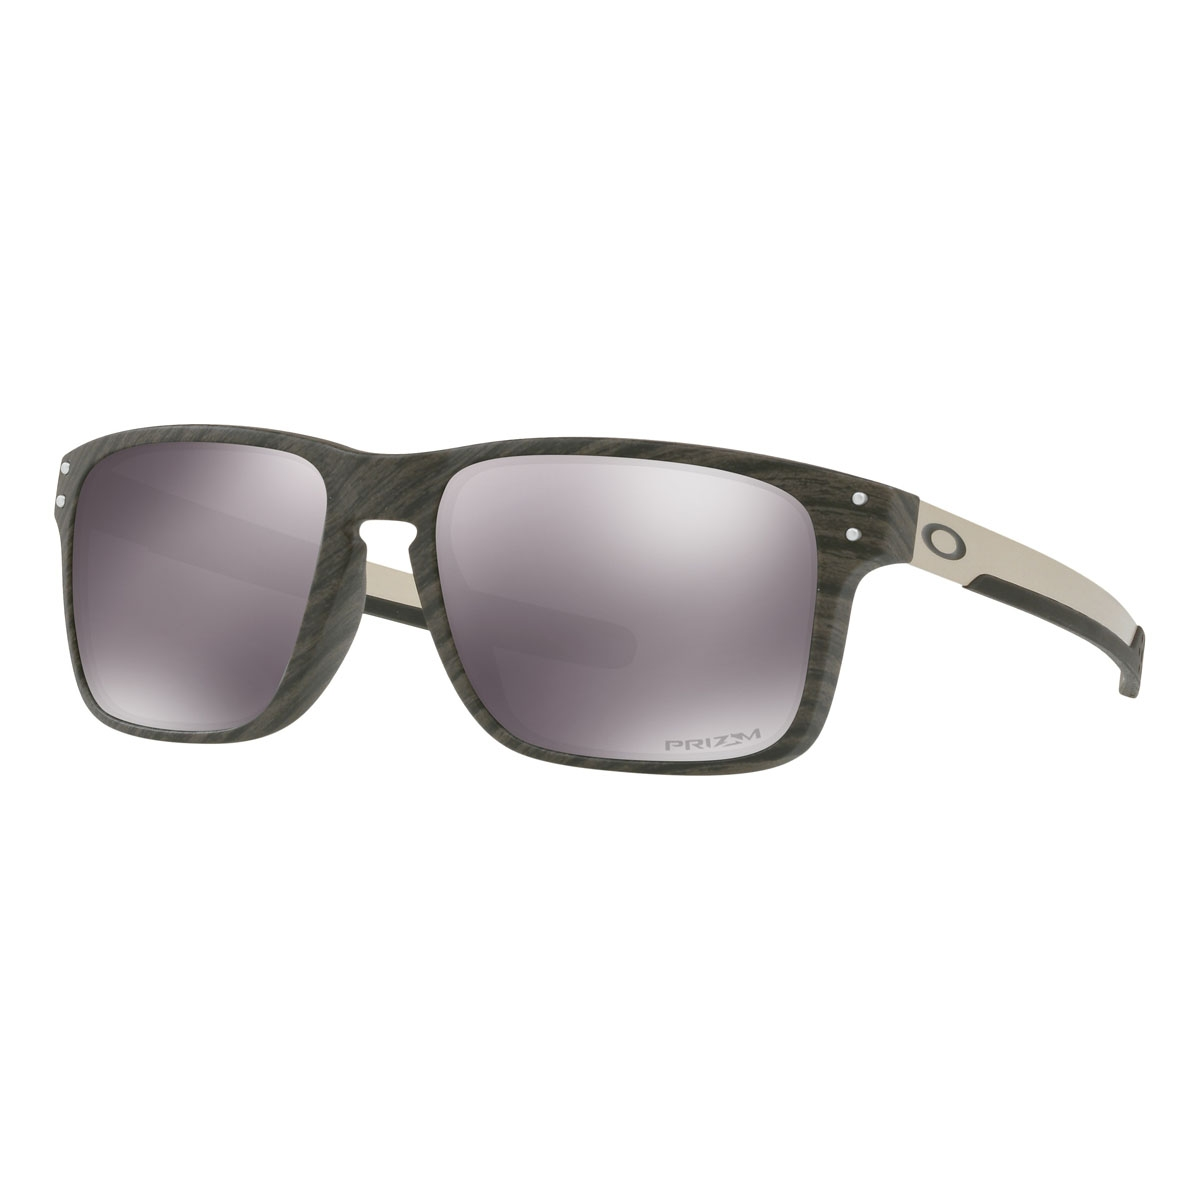 8dec77b52d7 ... polarized cb4b6 2993b  official store image of oakley holbrook mix prizm  sunglasses woodgrain frame prizm black lens ca614 803b0